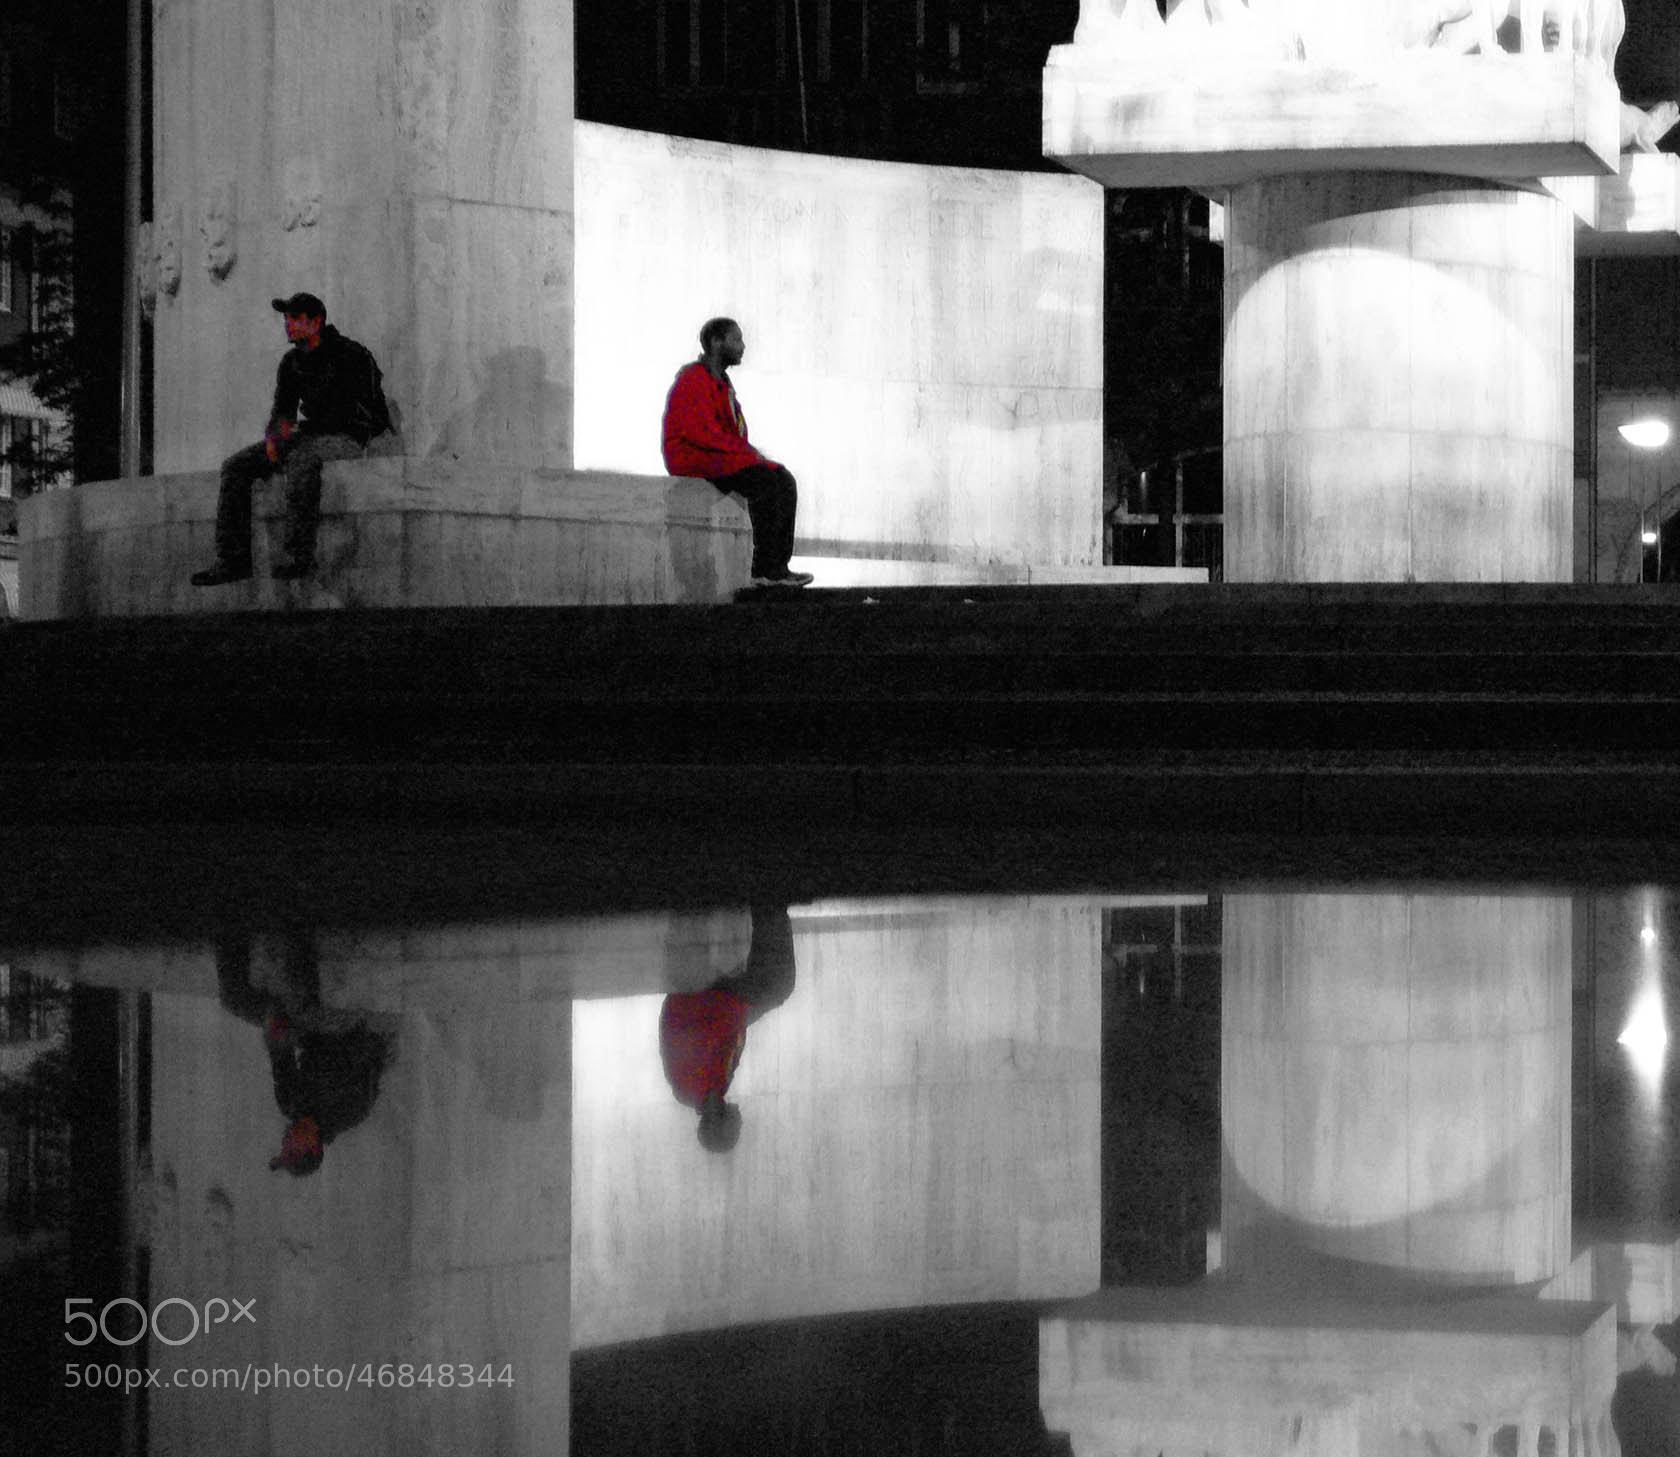 Photograph Black & White imagine by rnkvnm on 500px